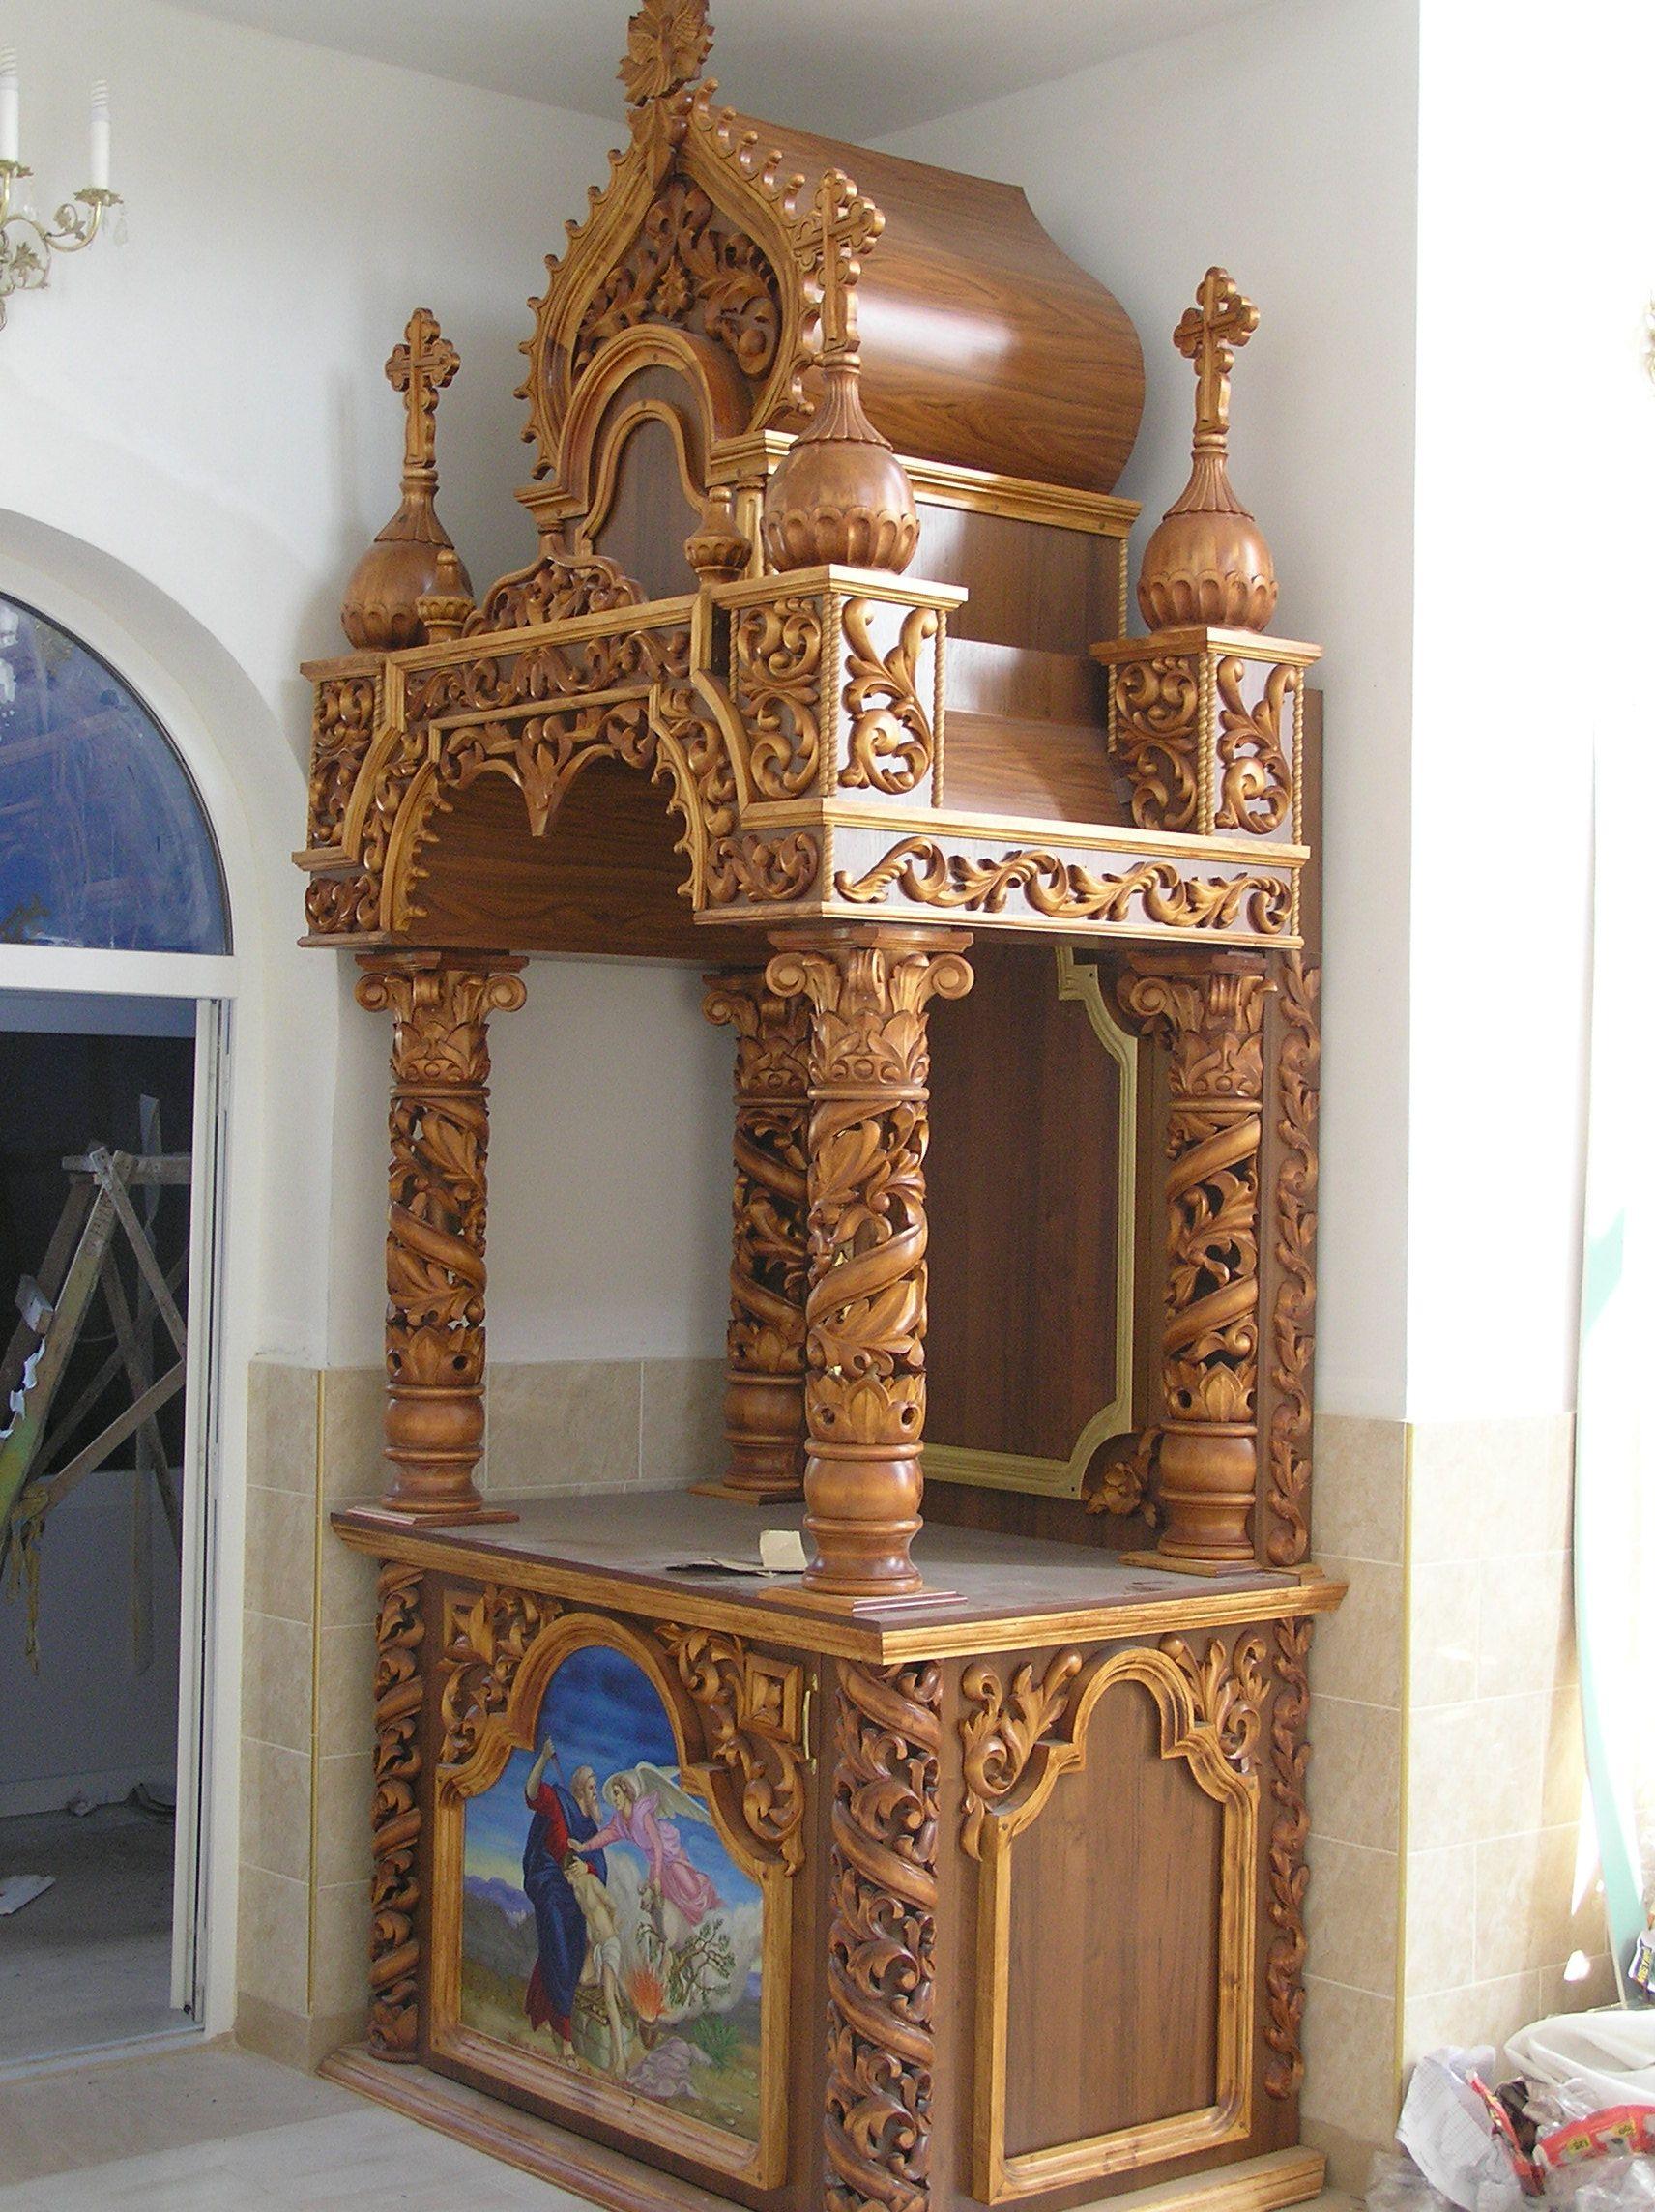 Bavas Wood Works Pooja Room Door Frame And Door Designs: Жертвенник из дерева,лакированный